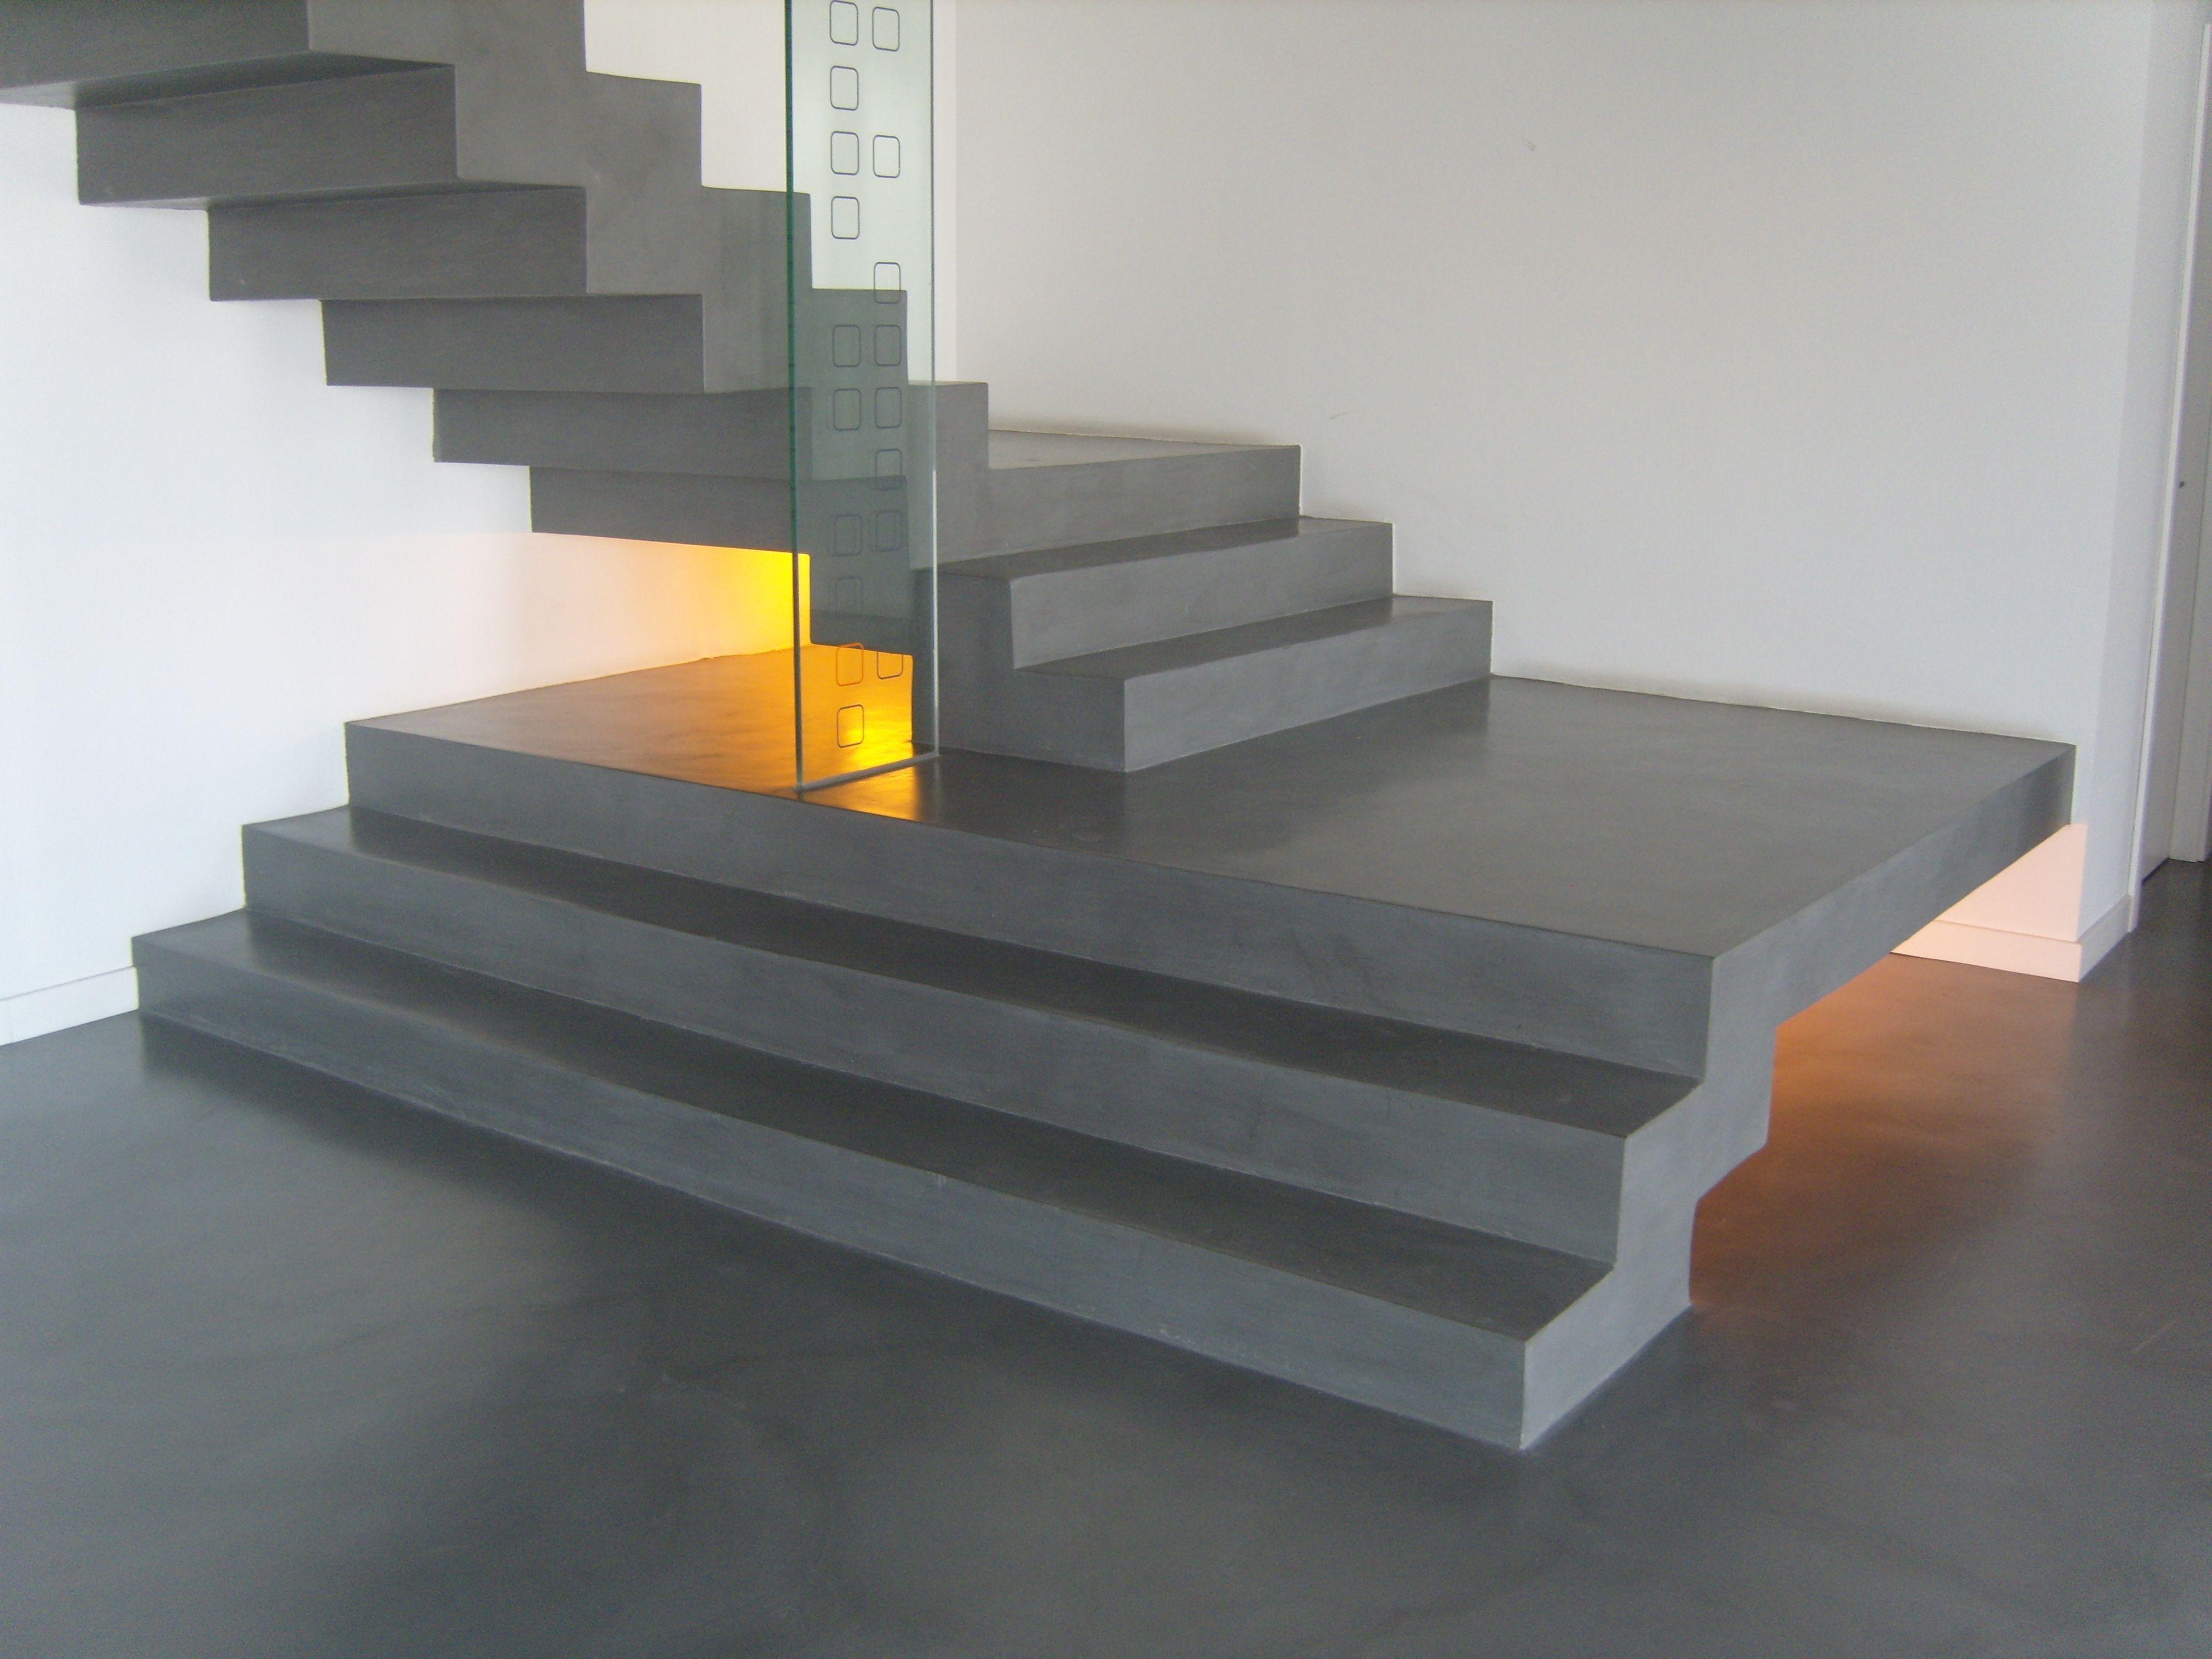 Escaleras modernas con estilo vanguardista escalera de for Escaleras de material